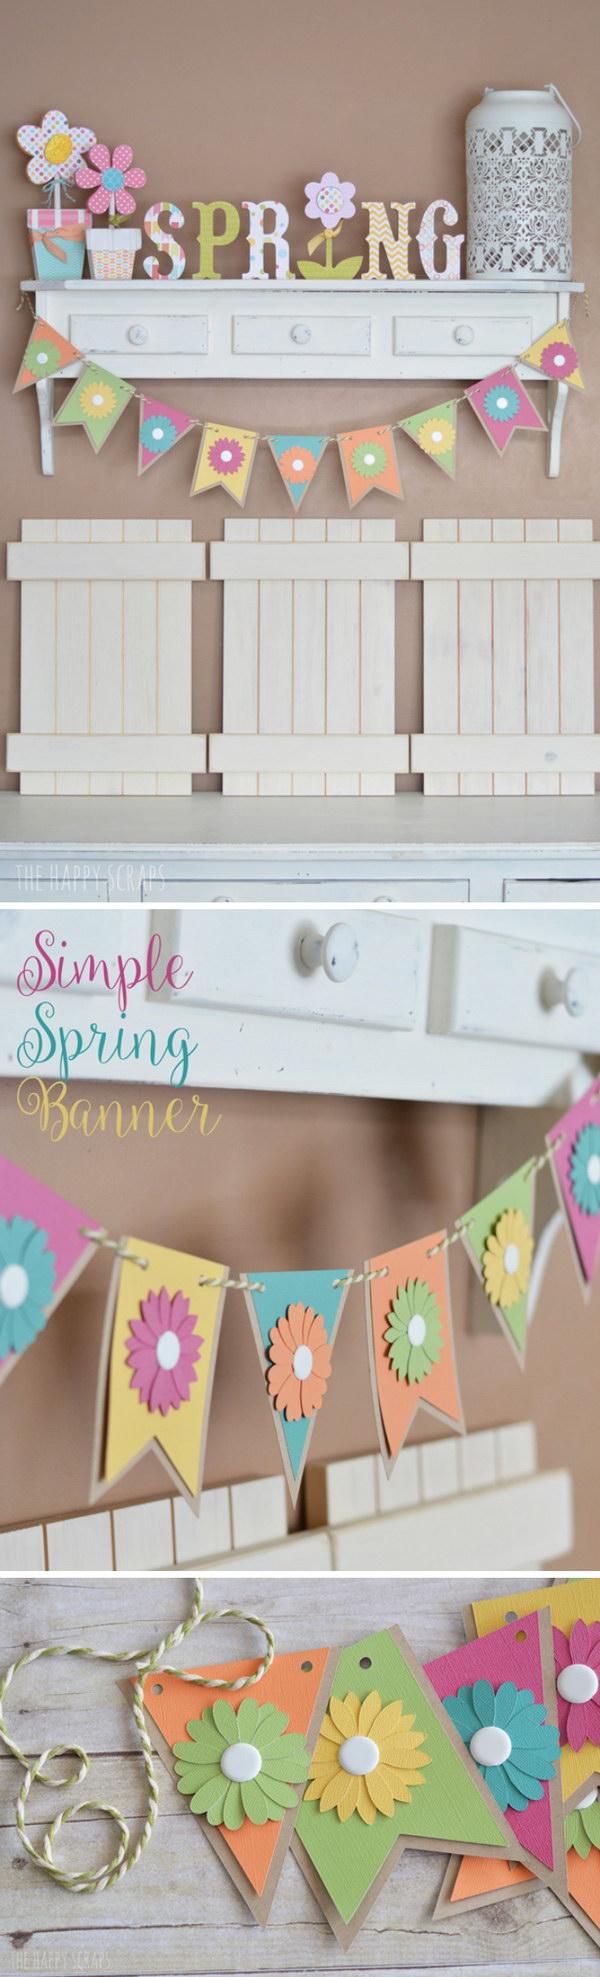 Simple DIY Spring Banner.